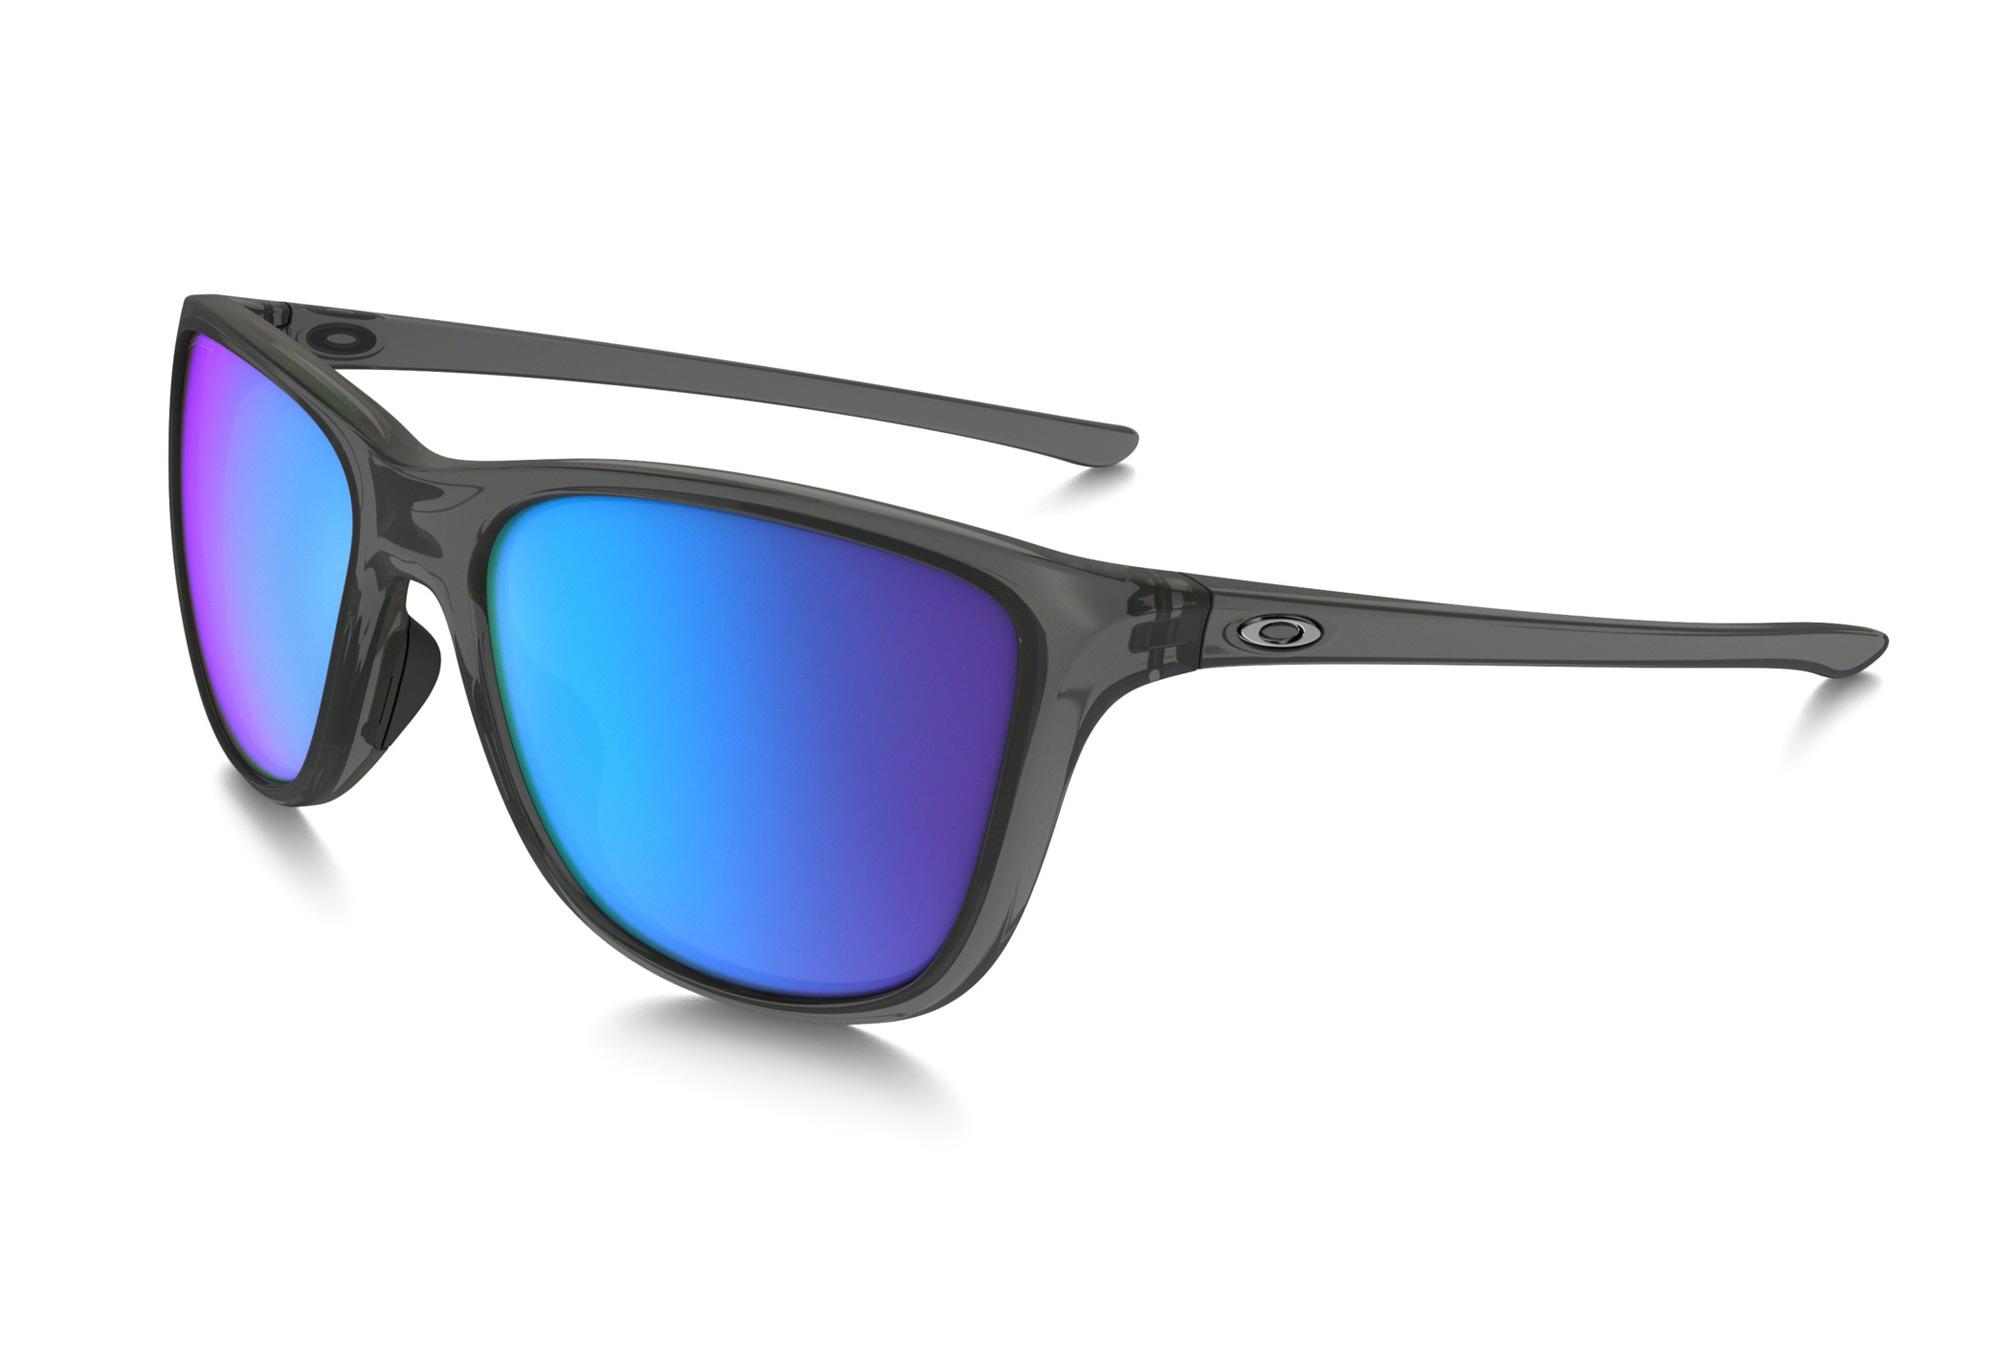 ae95c02294 OAKLEY Sunglasses Reverie Grey Smoke Sapphire Iridium Polarized Ref  OO9362-0655